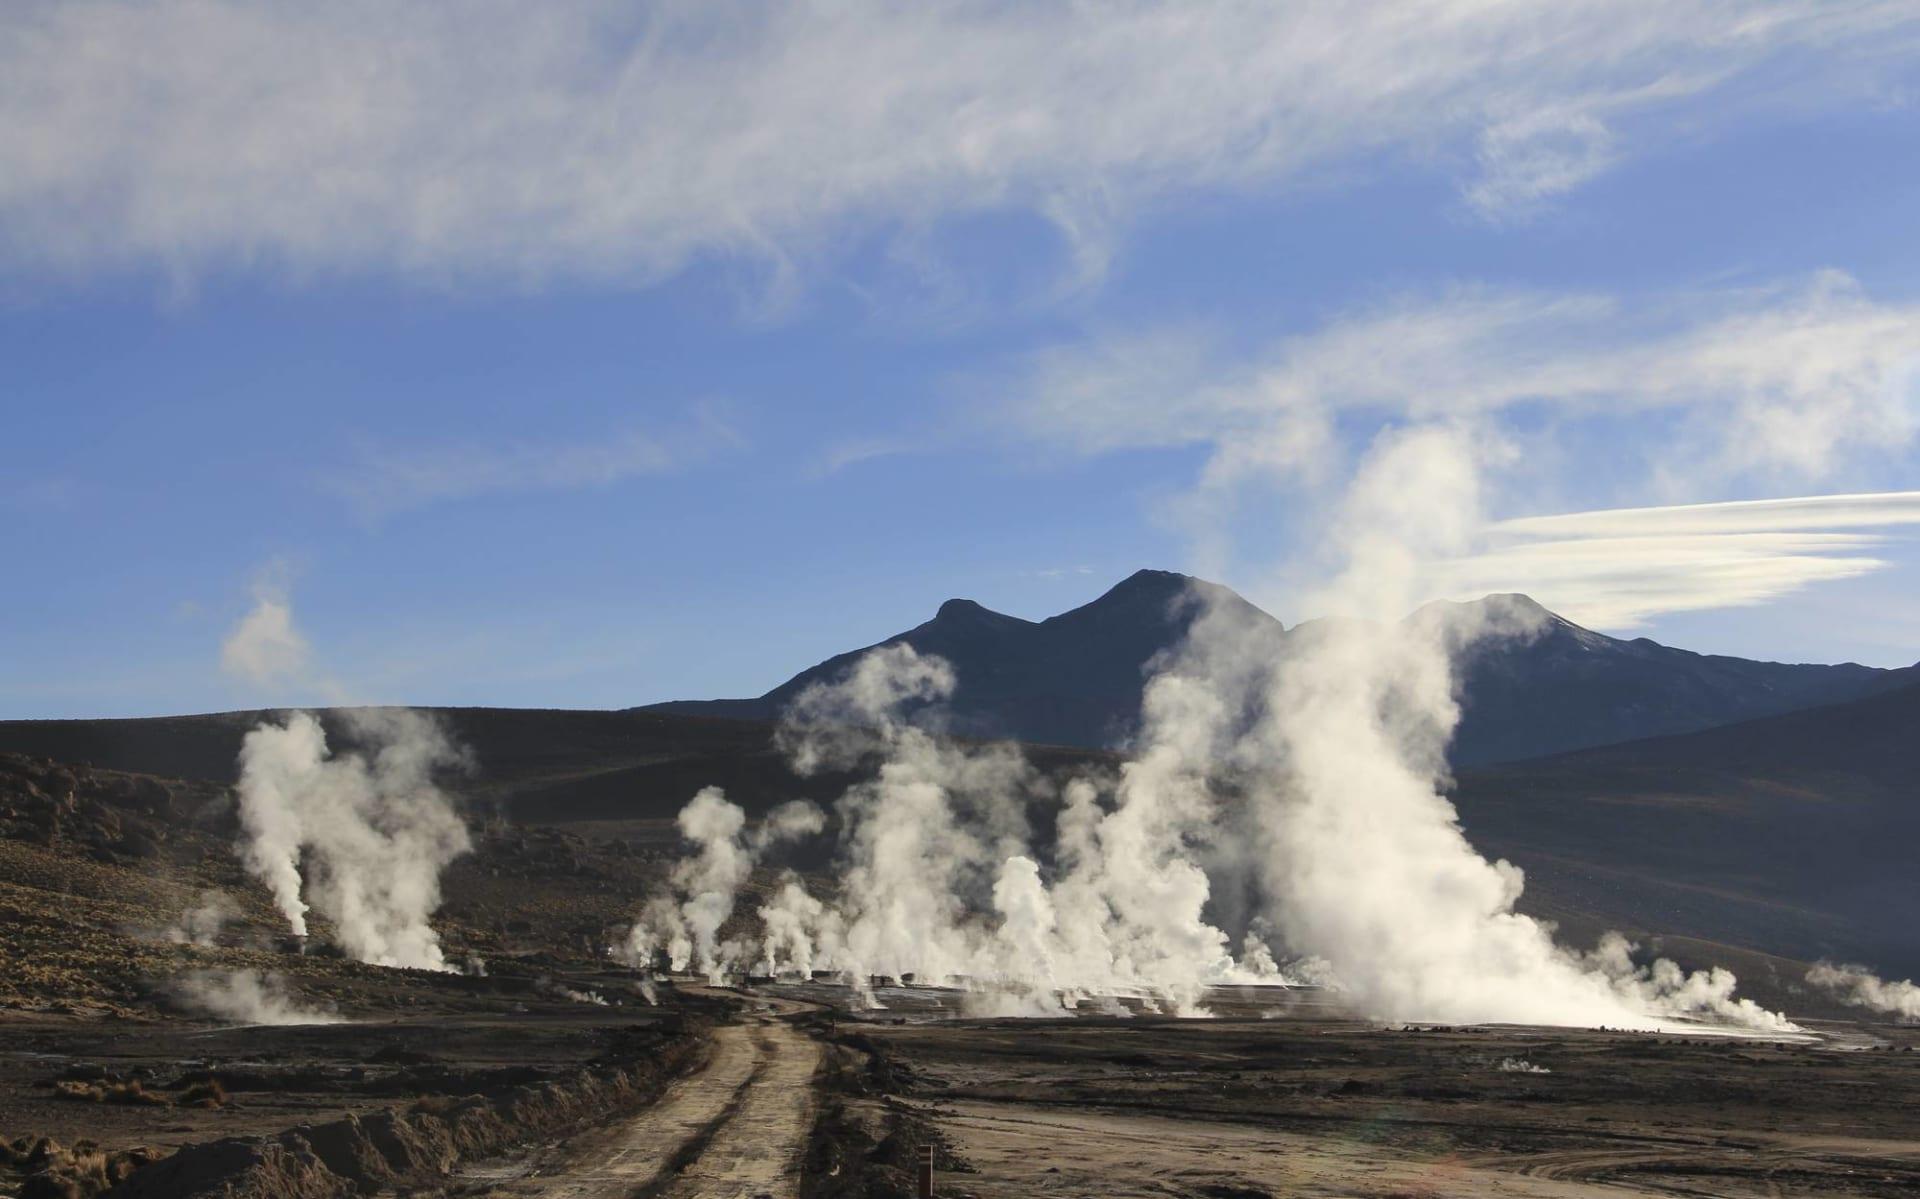 Salta - Atacama Wüste – Salta: Argentinien - Atacama - Hot Springs